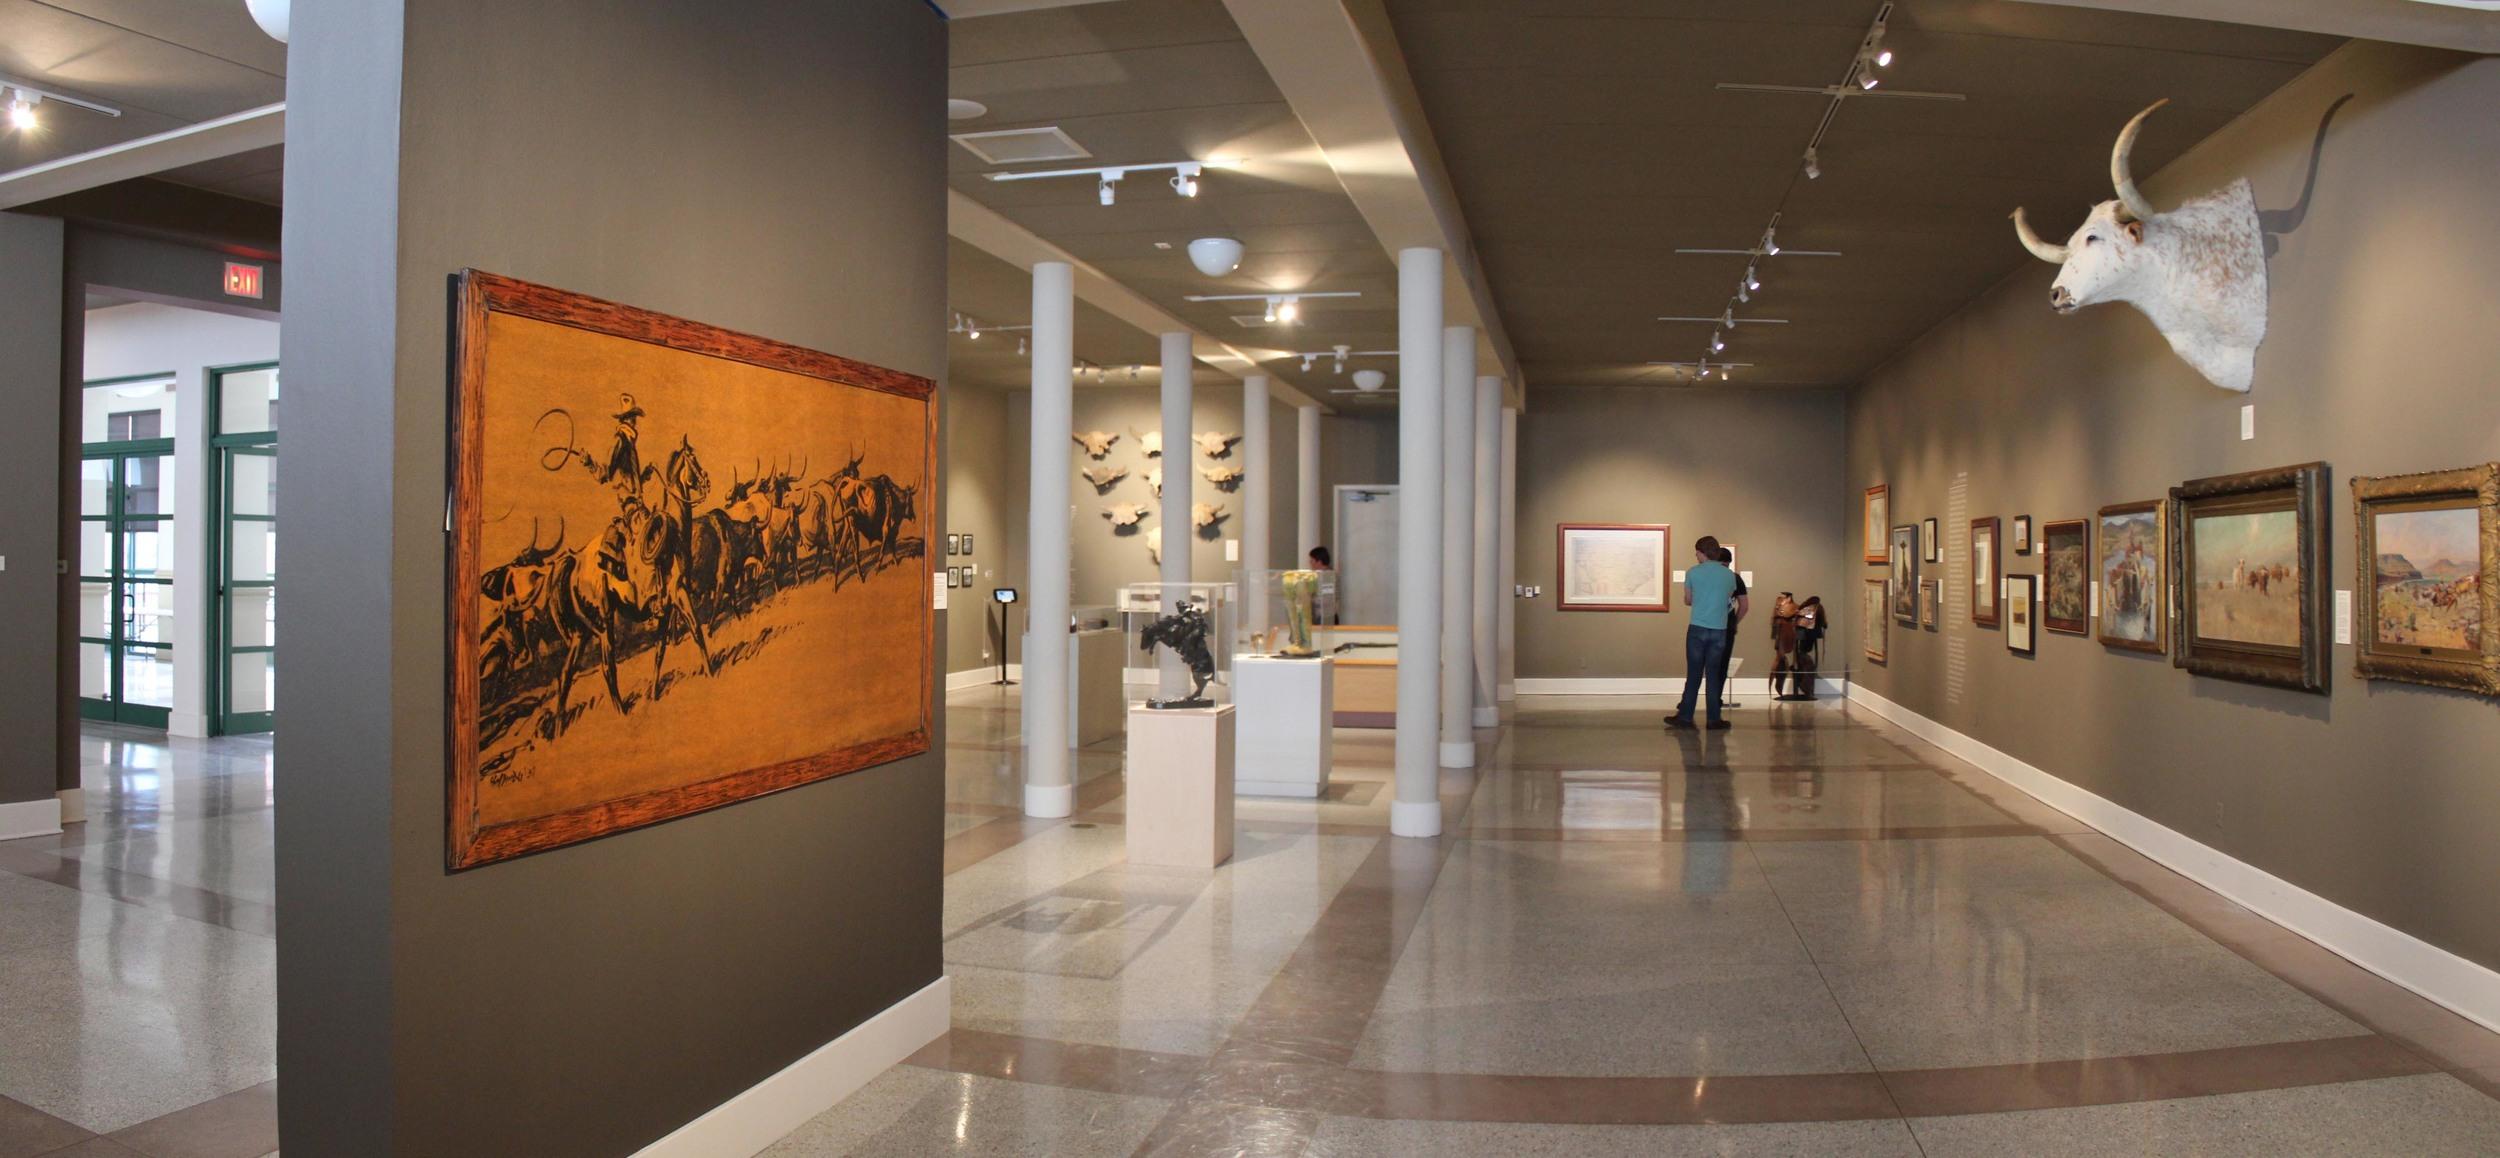 main_gallery2.jpg